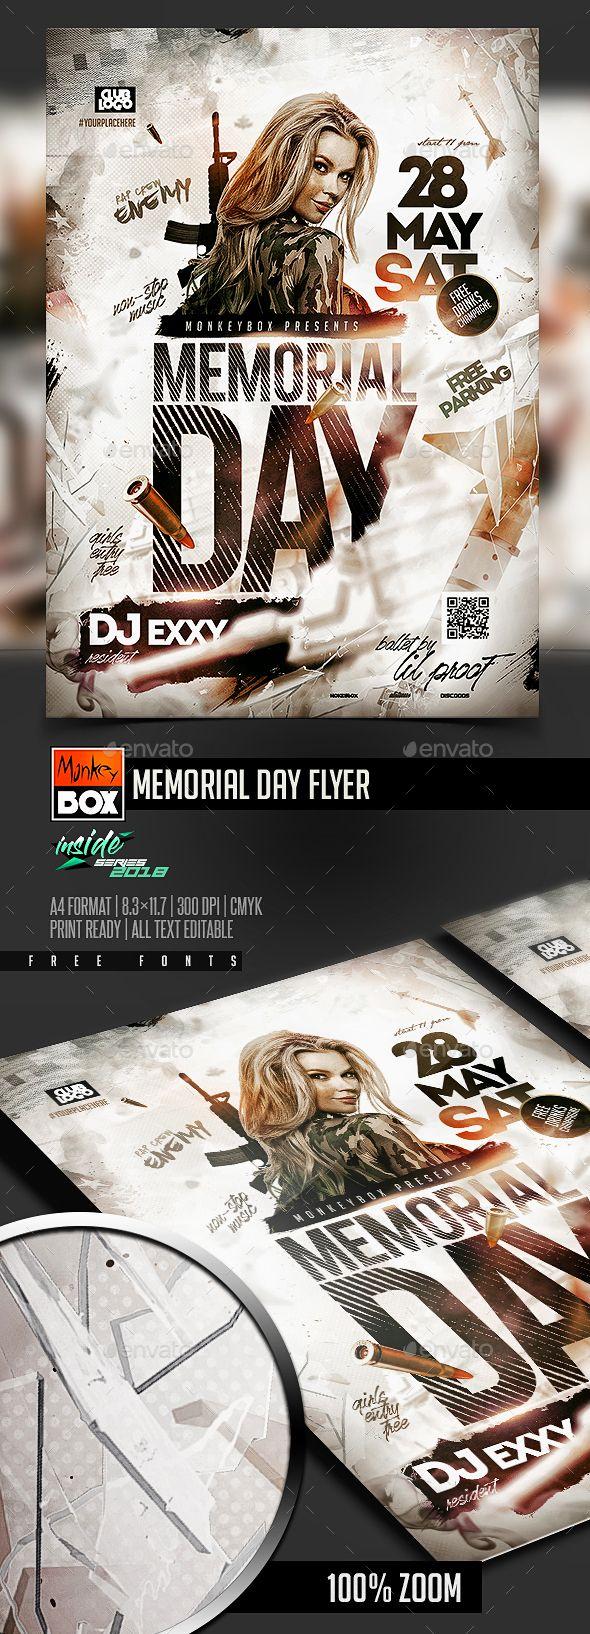 memorial day flyer facebook ads pinterest flyer design design